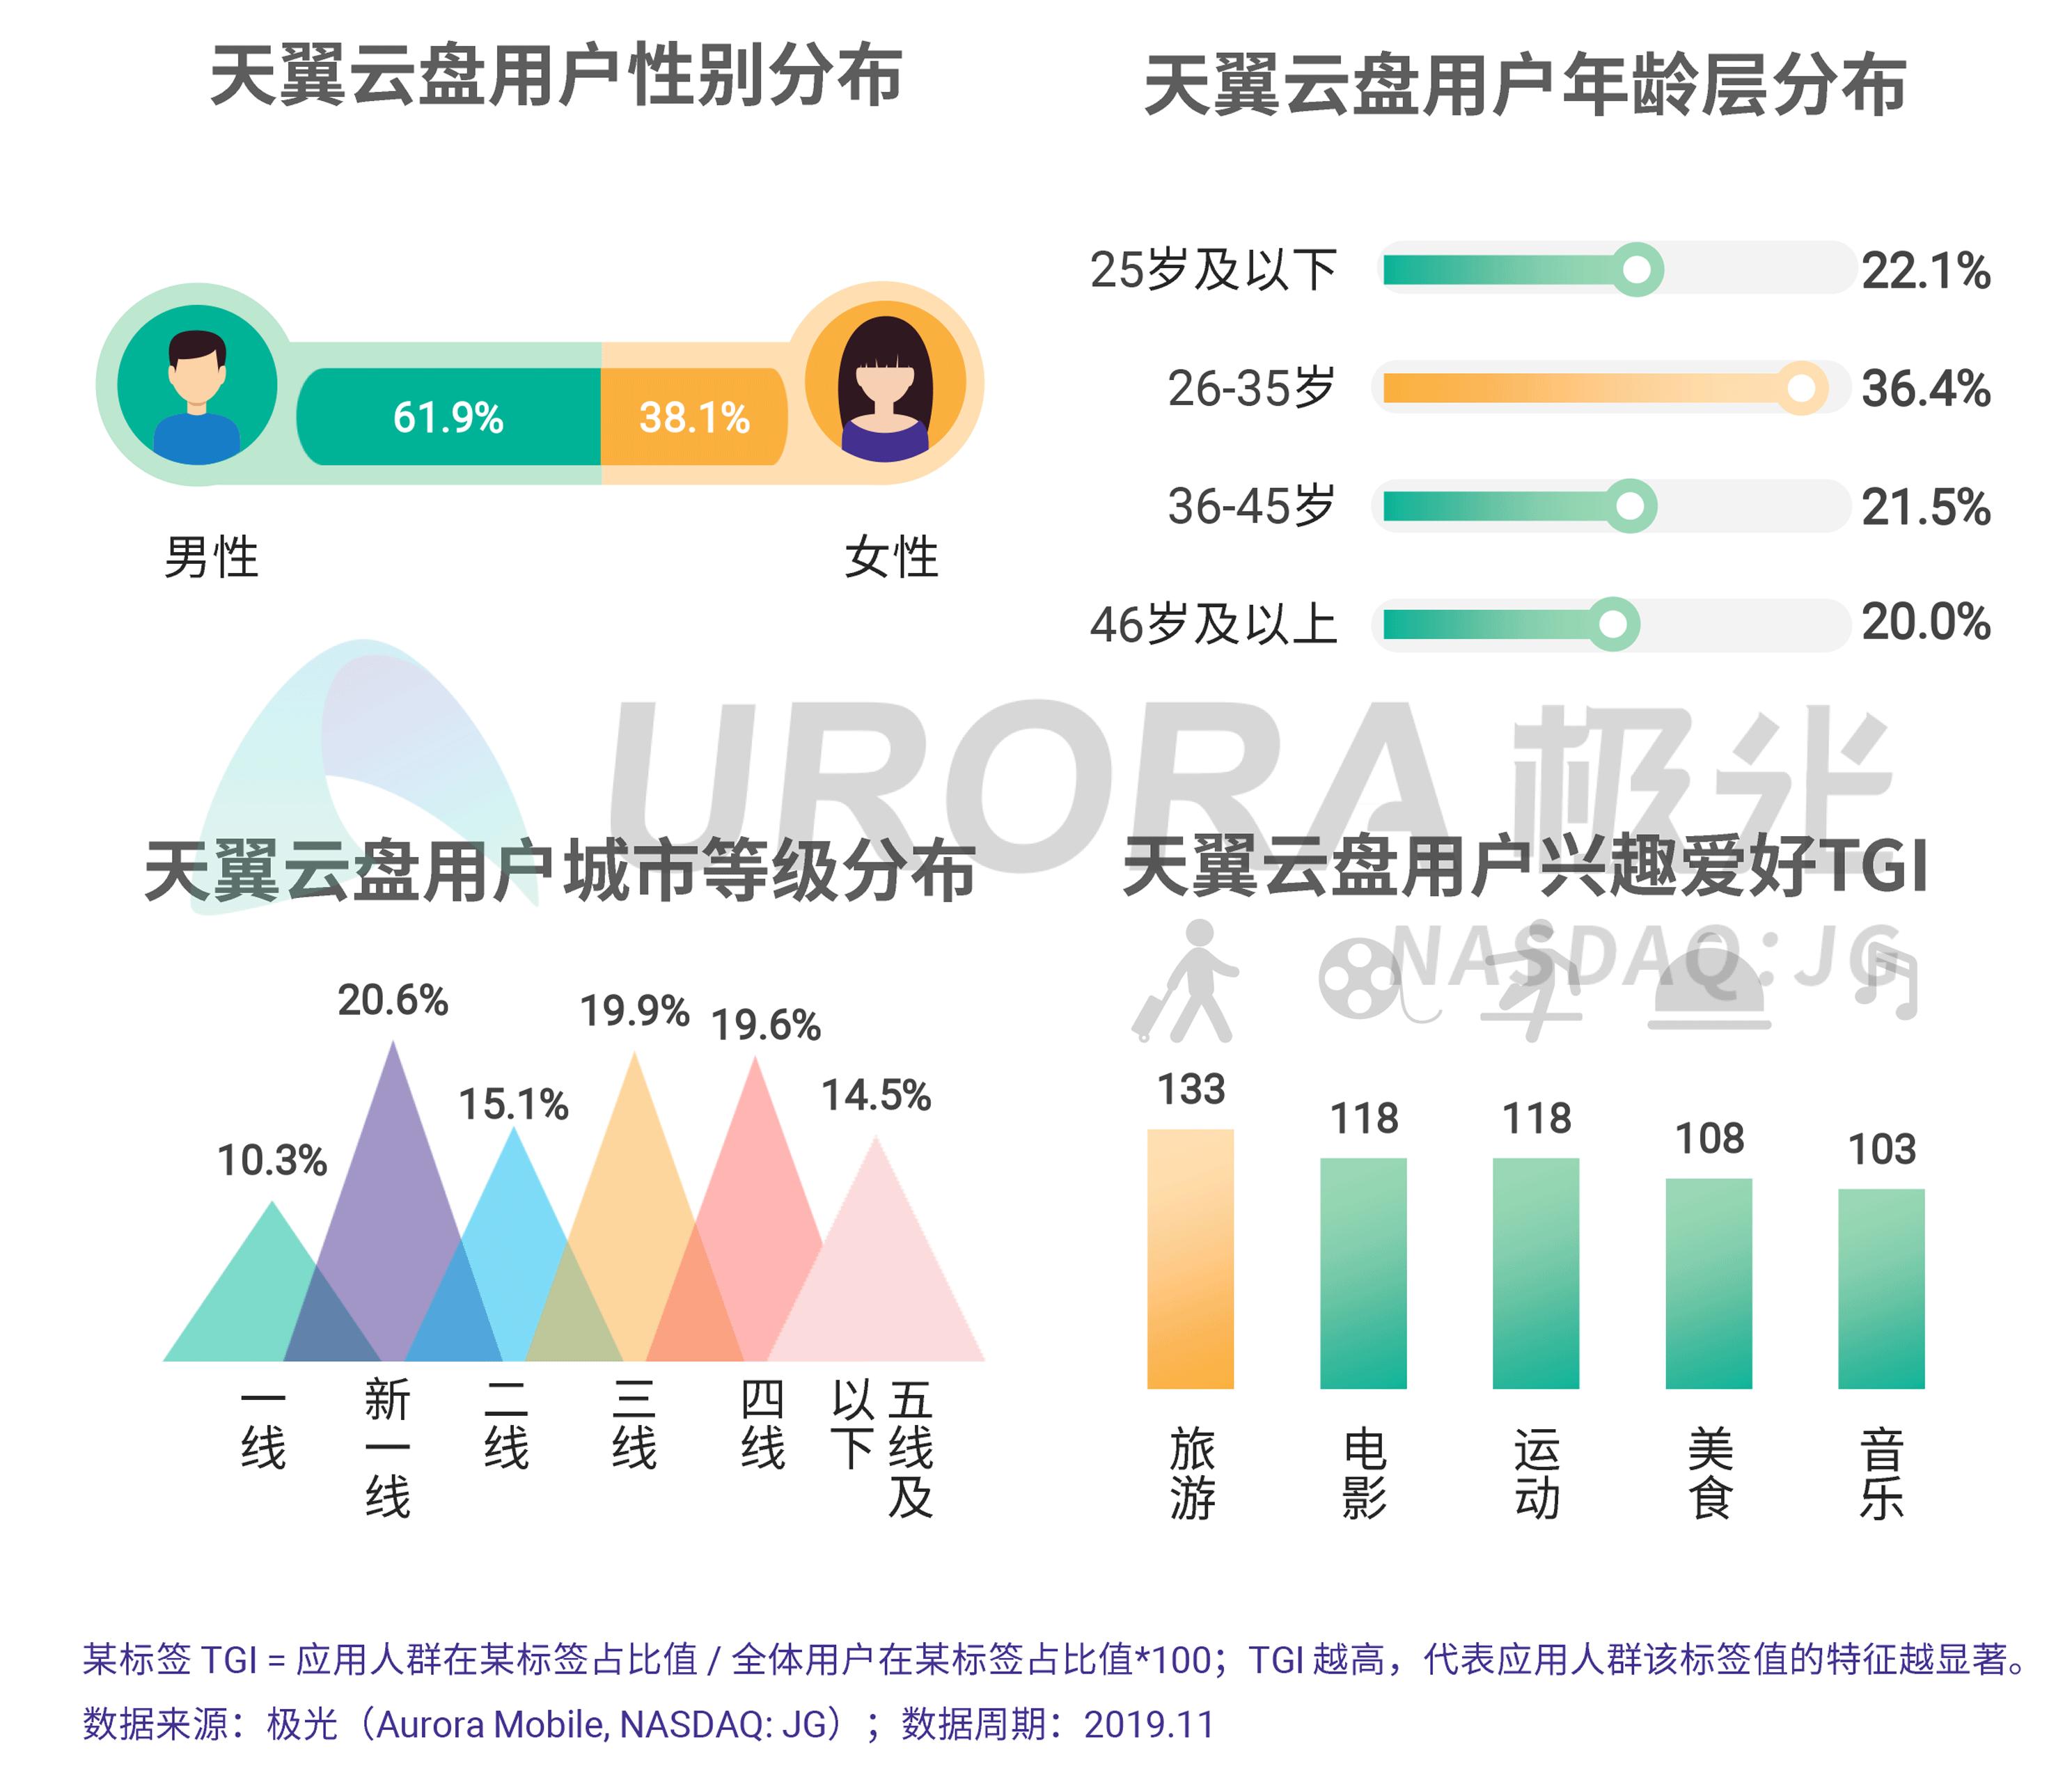 JIGUANG-个人网盘行业研究报告-final---切图版2-21.png